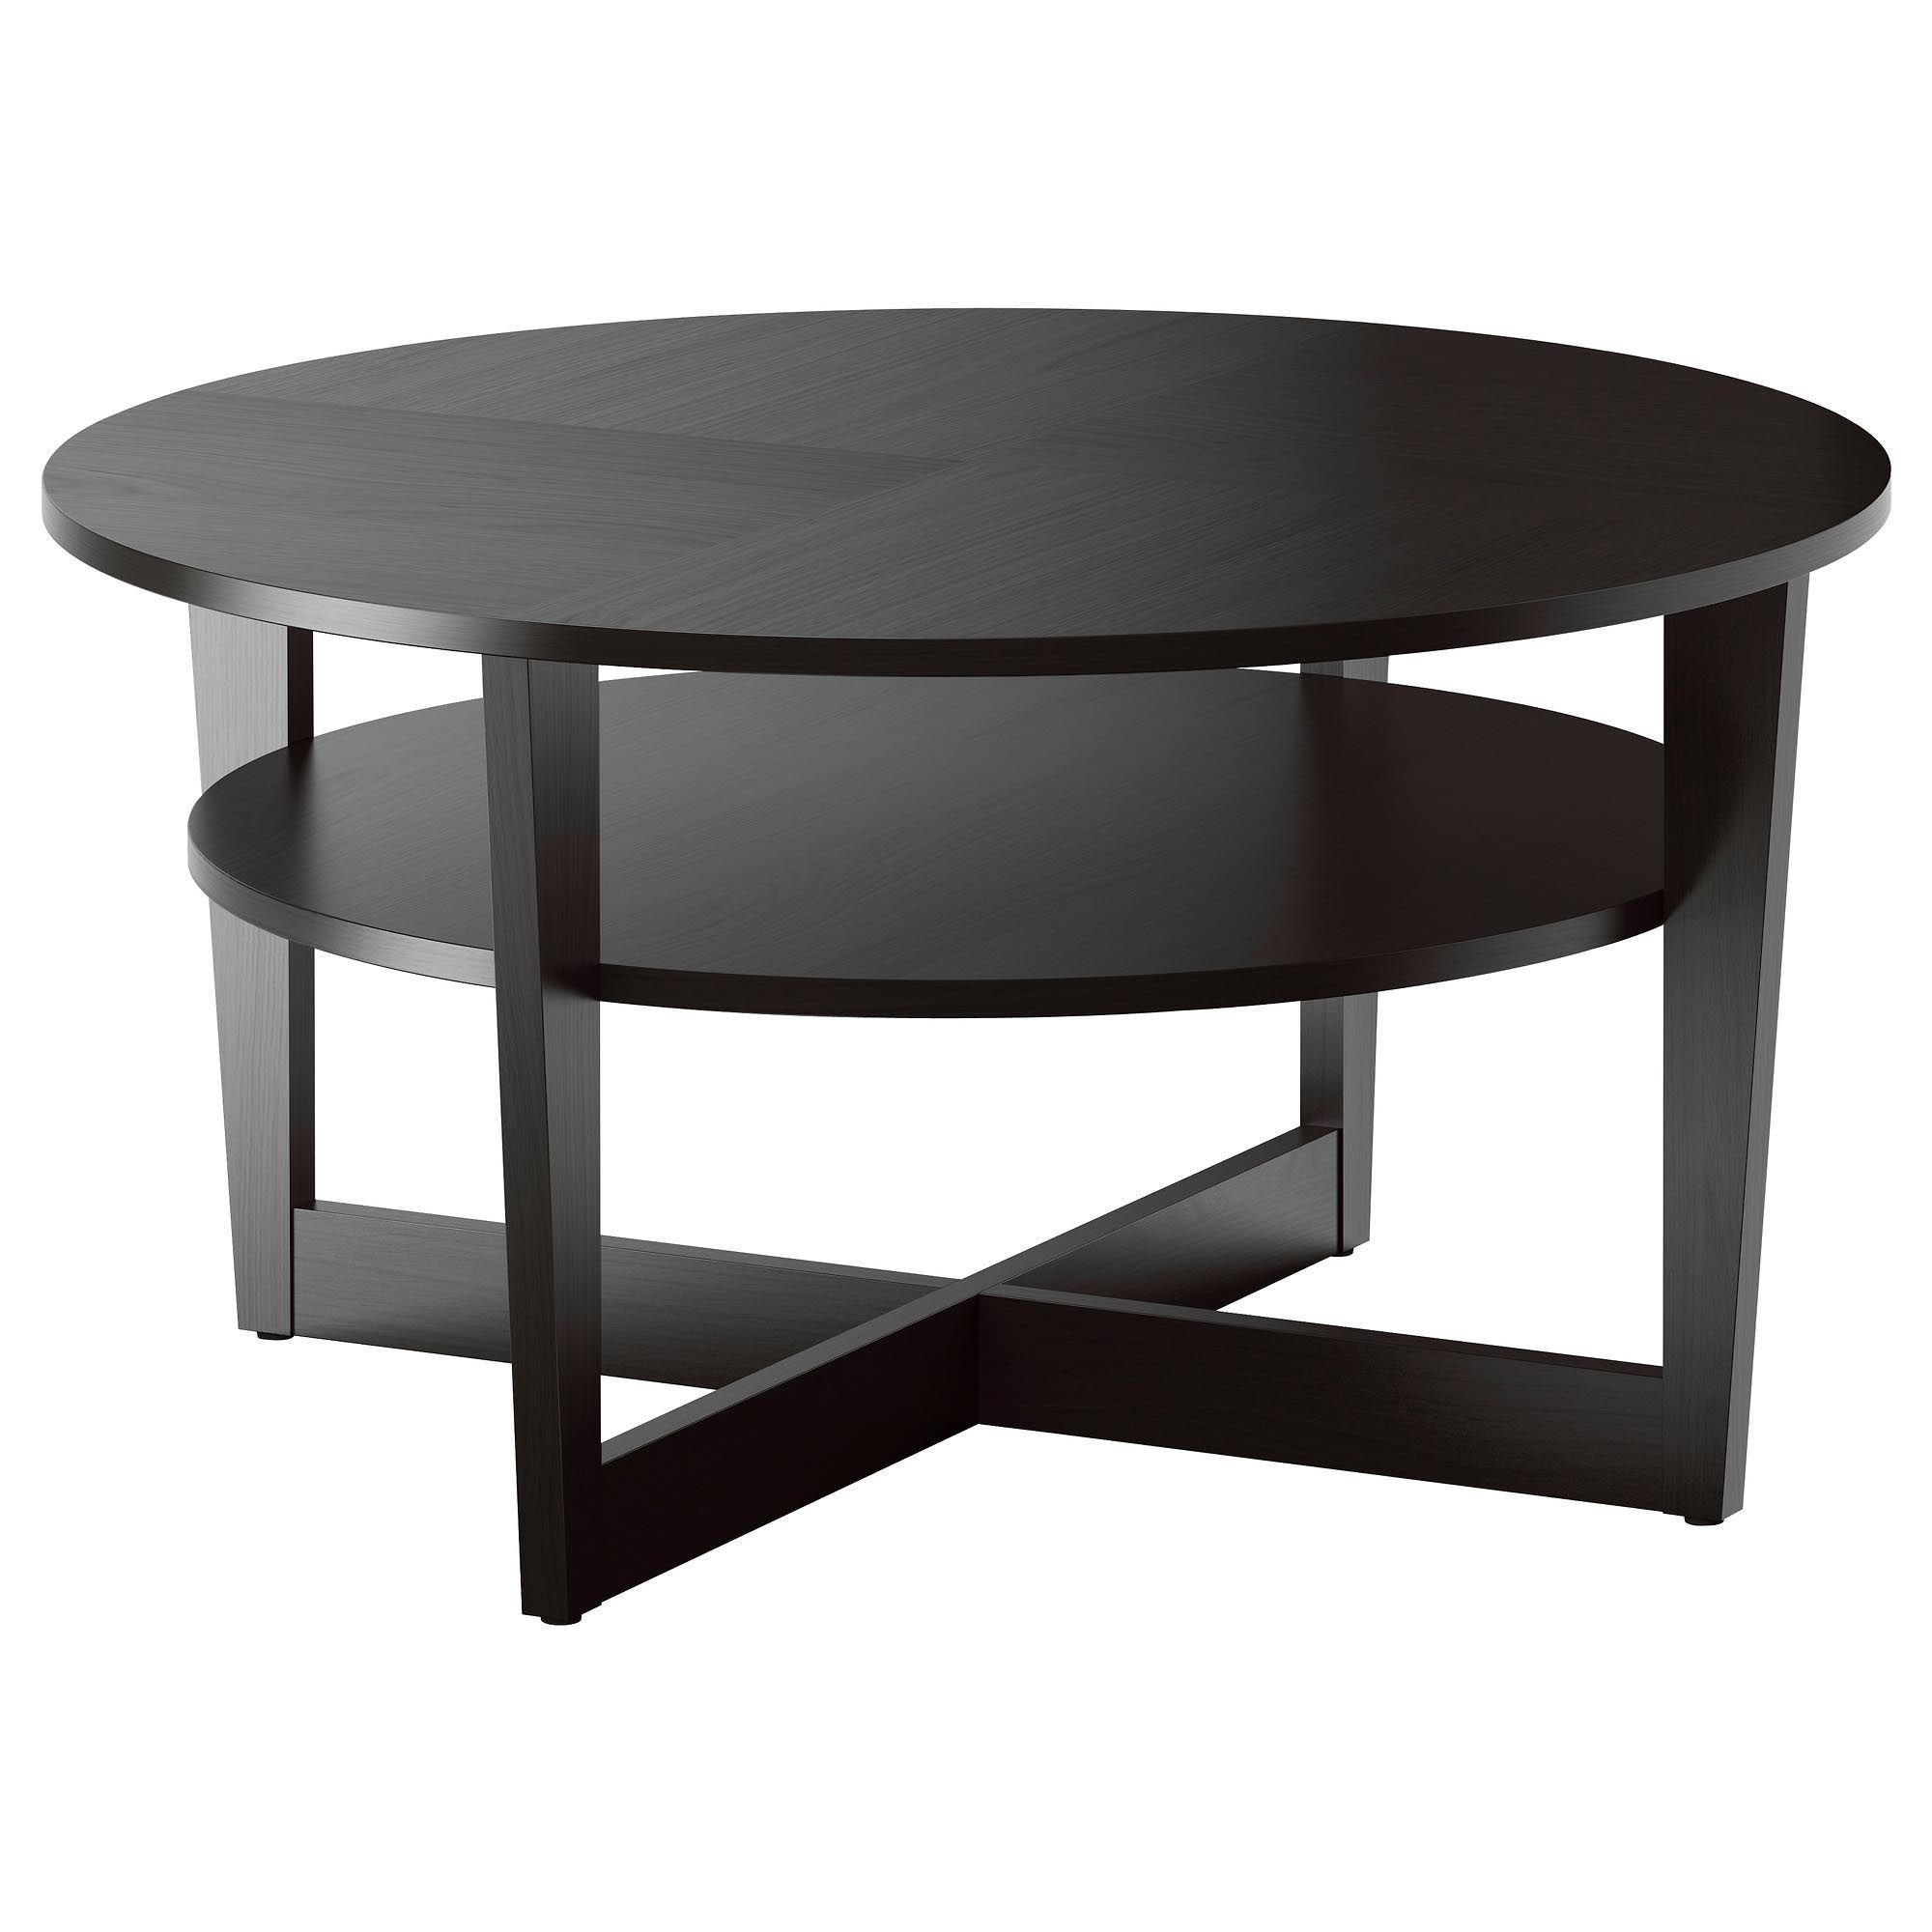 13+ White rectangle coffee table ikea ideas